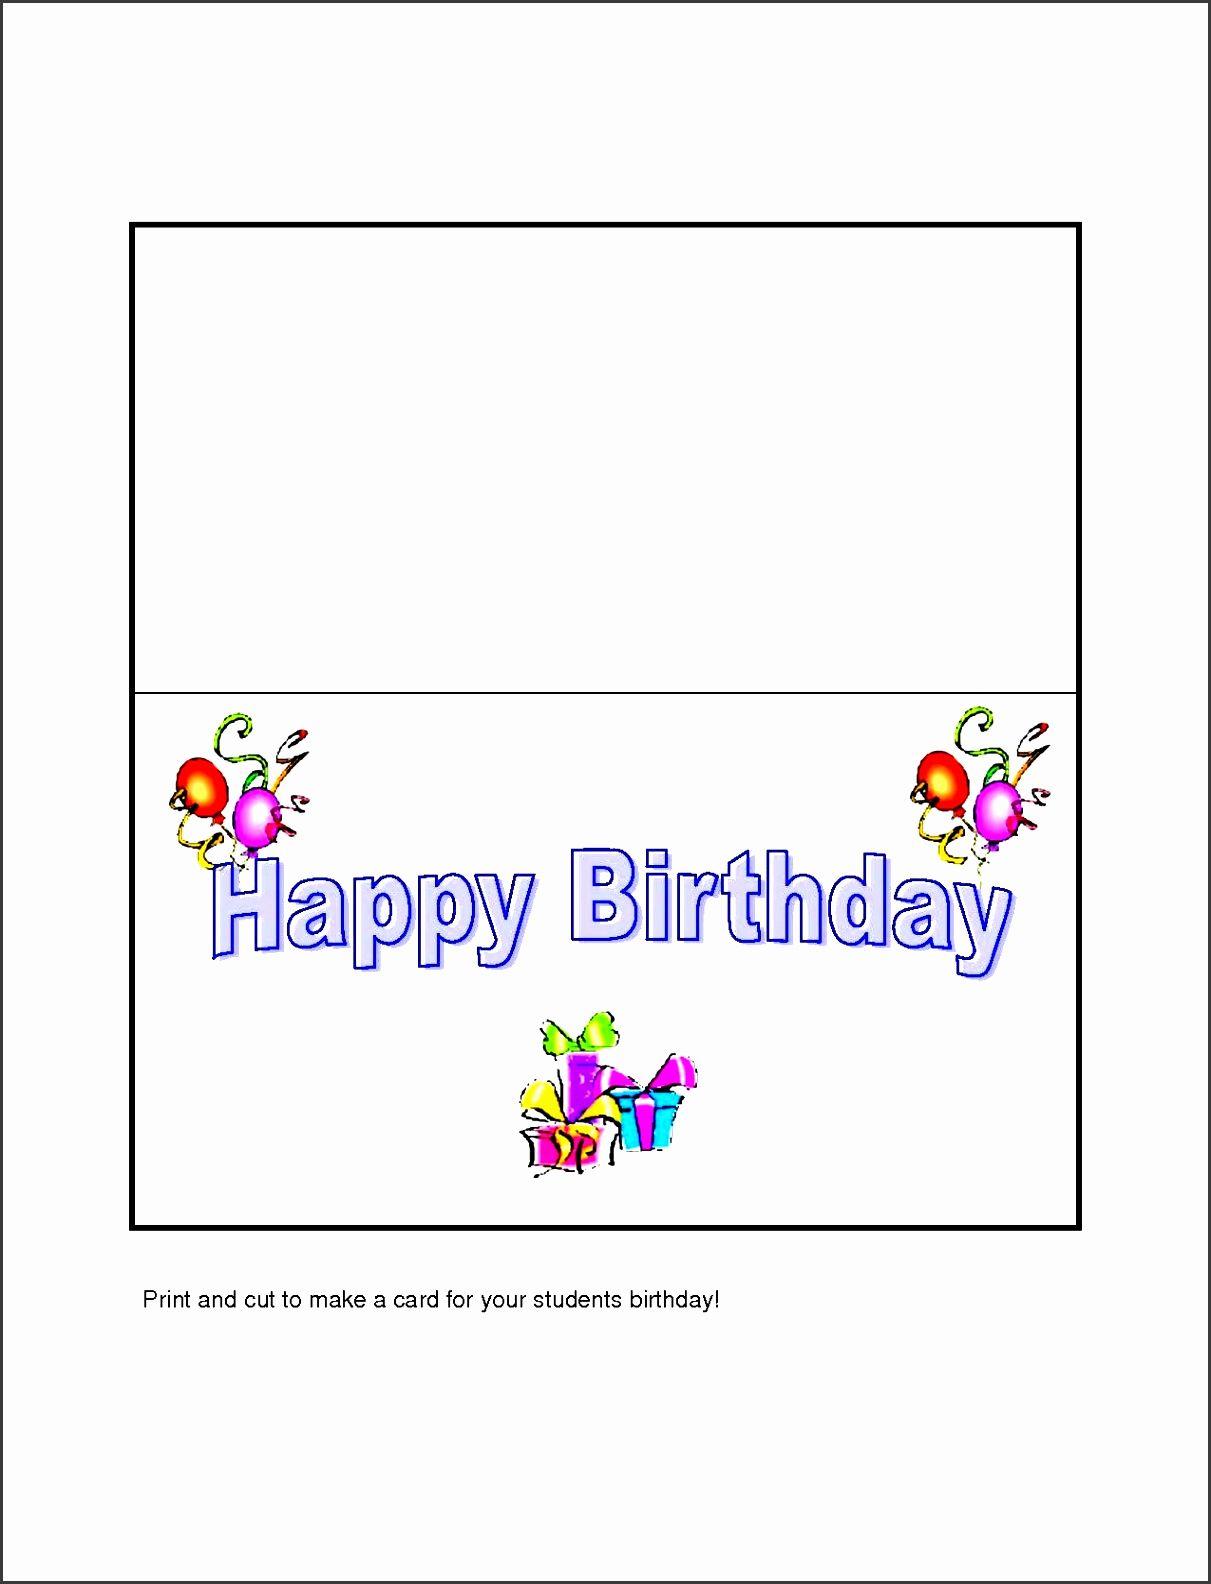 Beautiful 10 free microsoft word greeting card templates